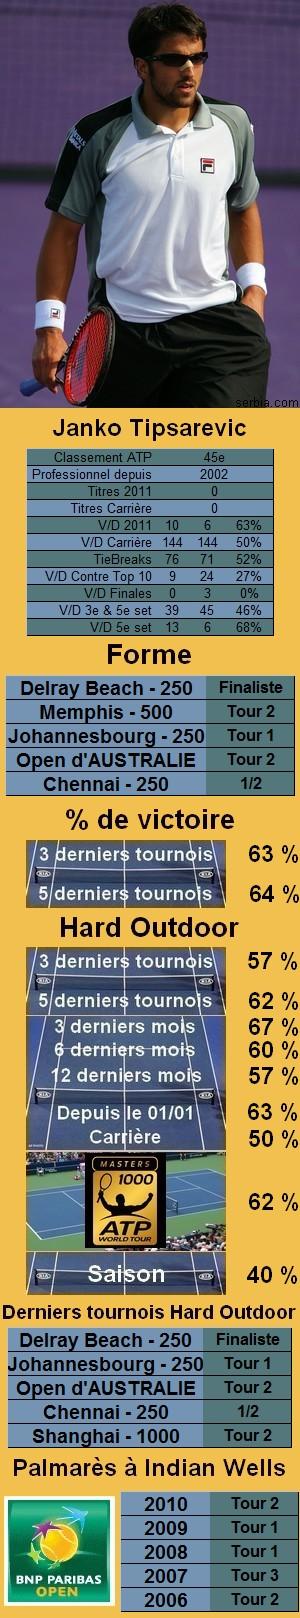 Statistiques tennis Janko Tipsarevic